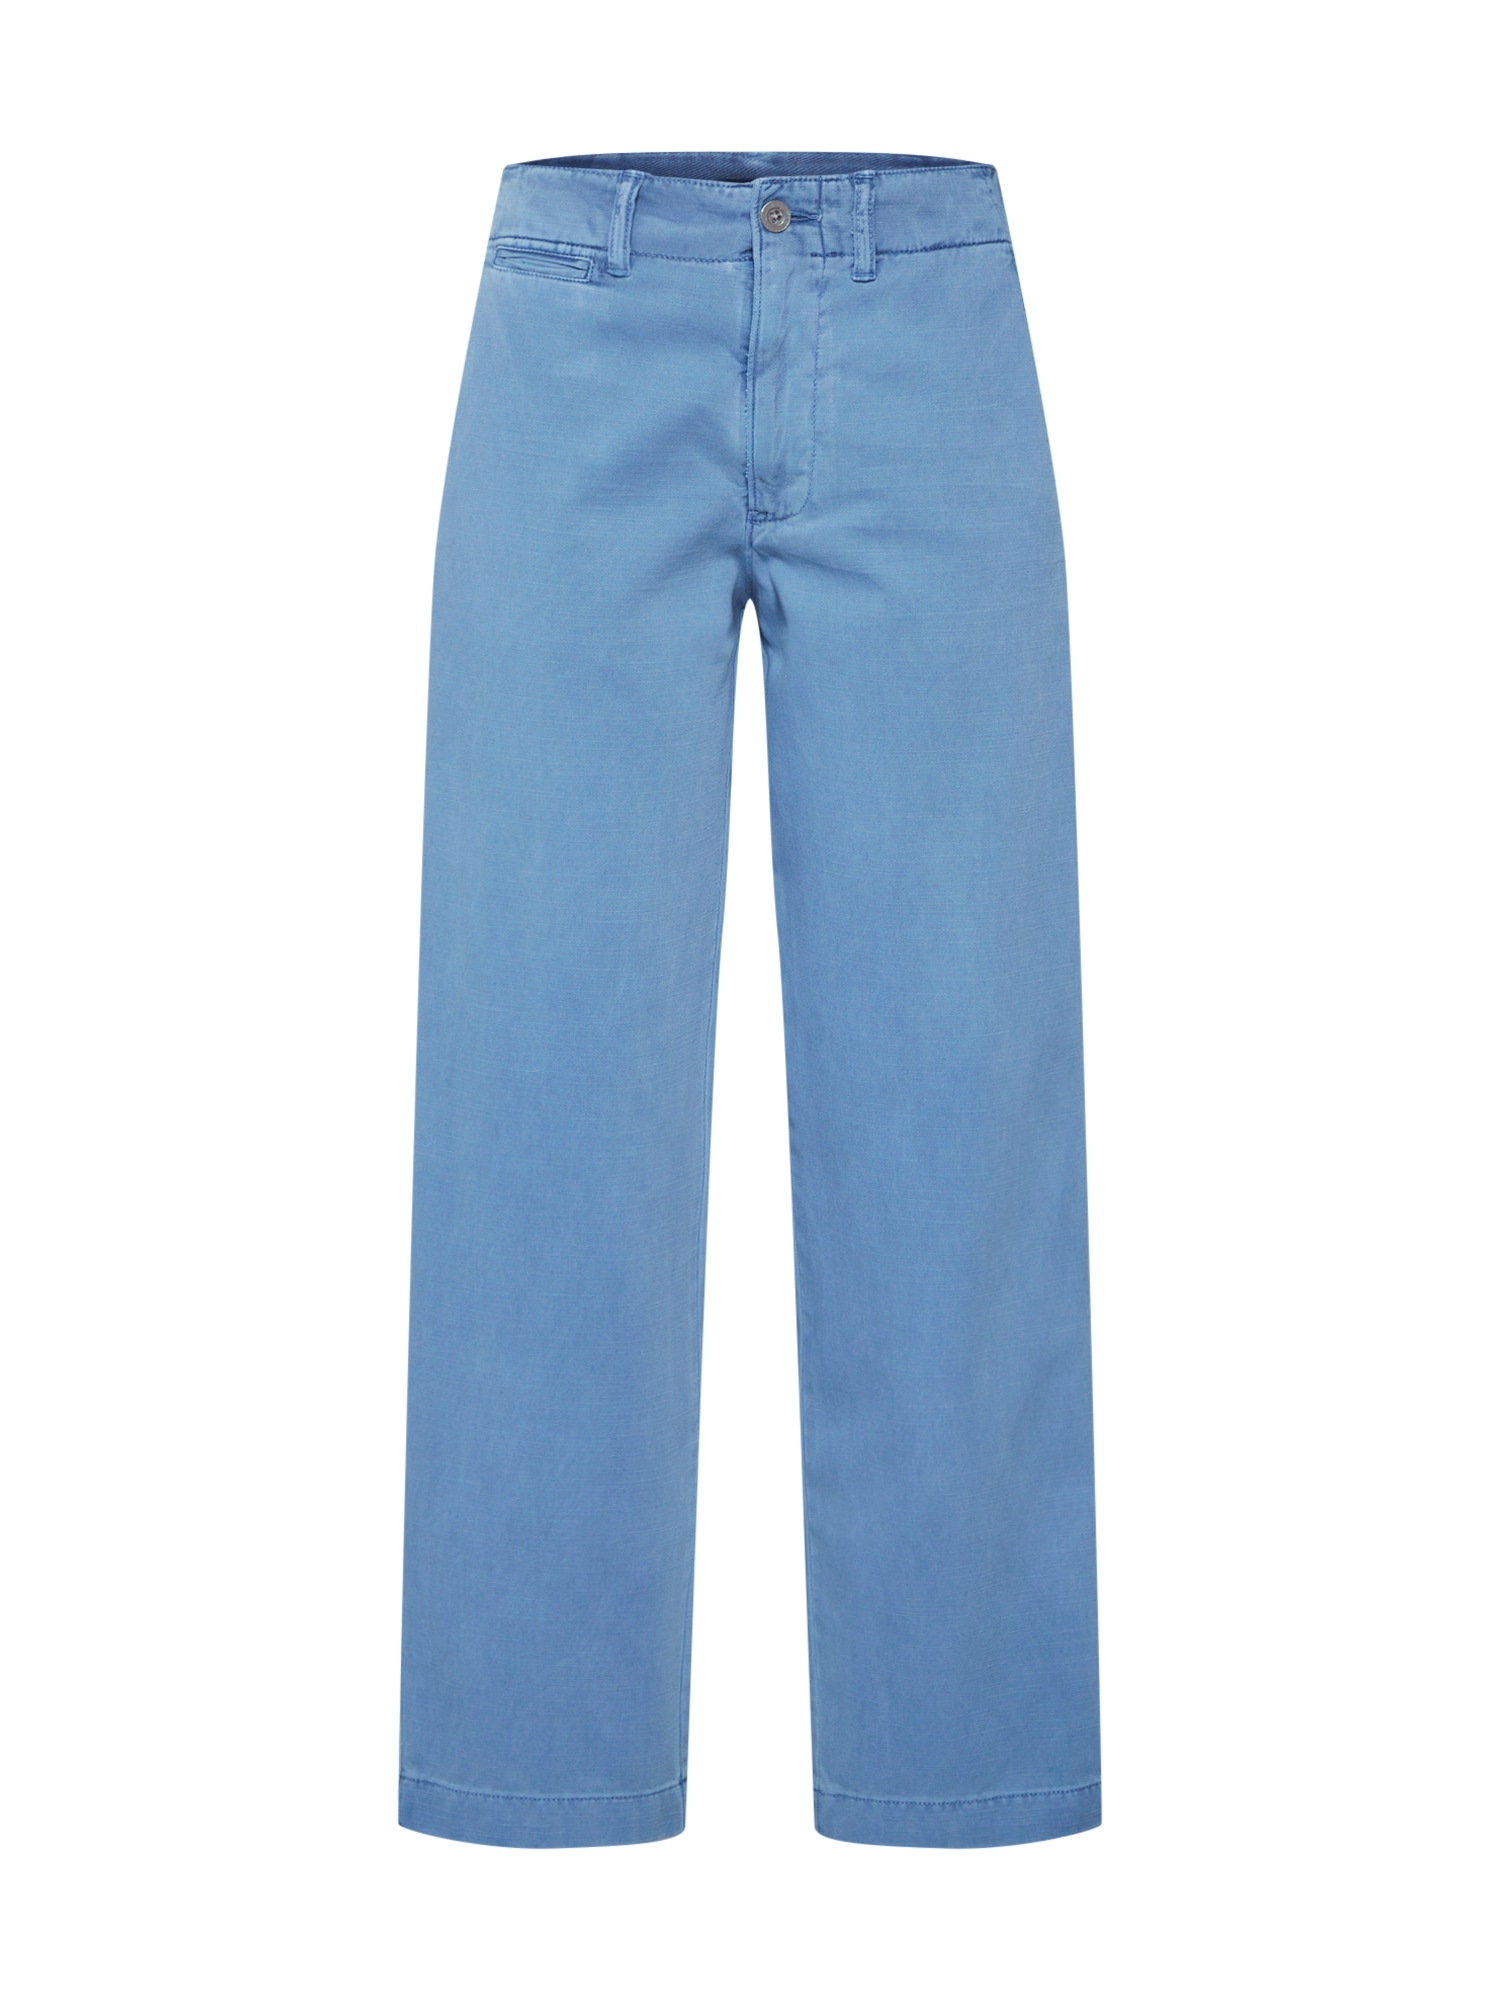 Kalhoty modrá POLO RALPH LAUREN